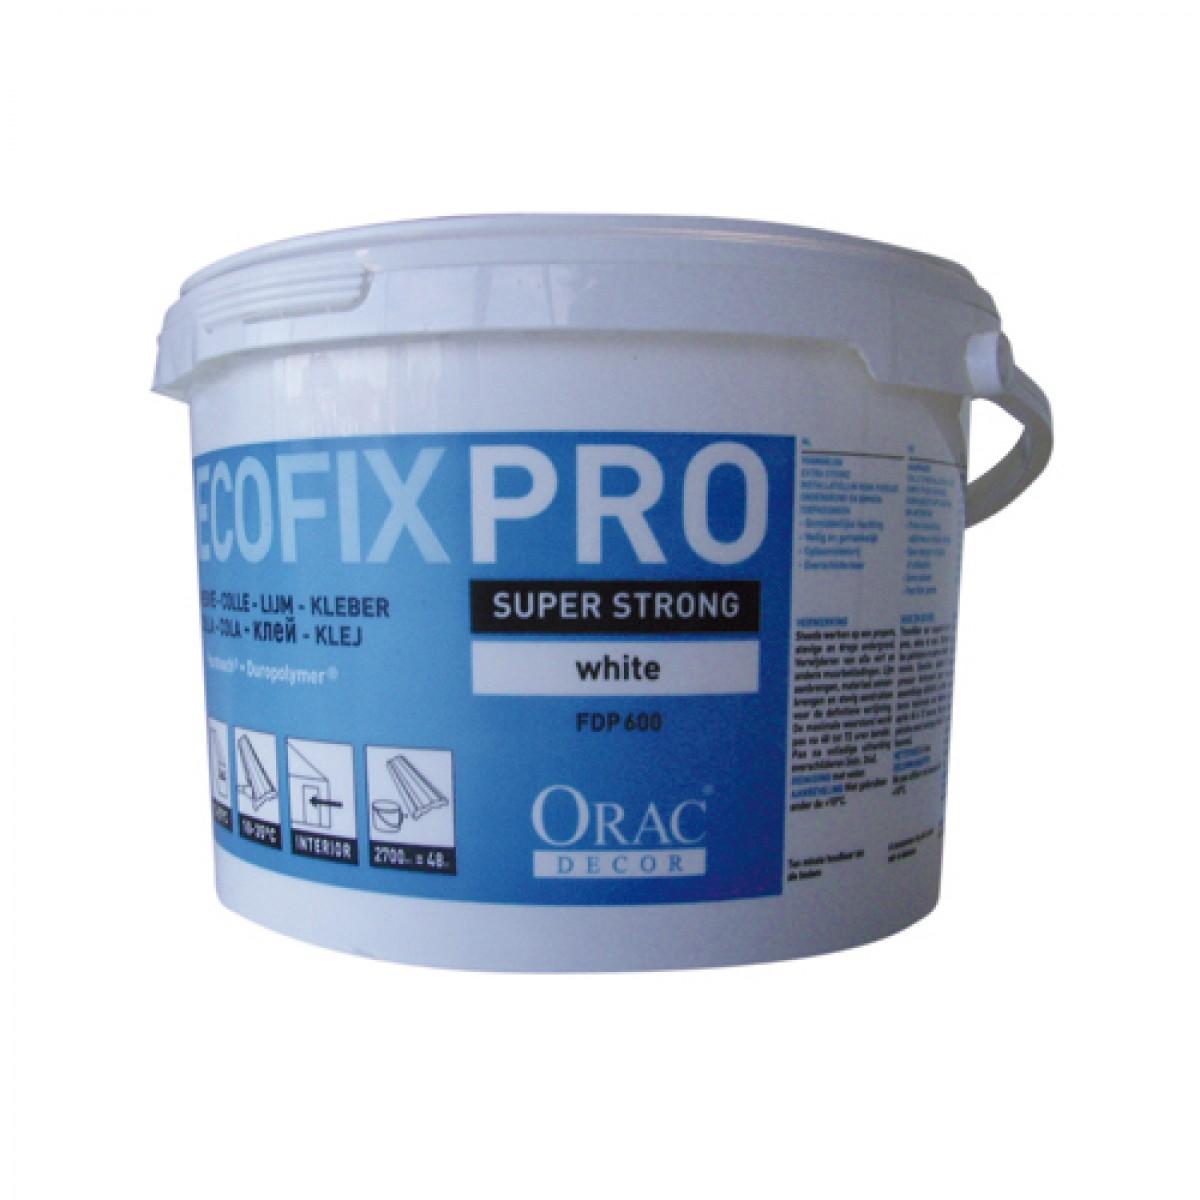 Adeziv Orac Decofix Pro 4200 Ml (6,4 Kg) 0 FDP600, Orac Decor